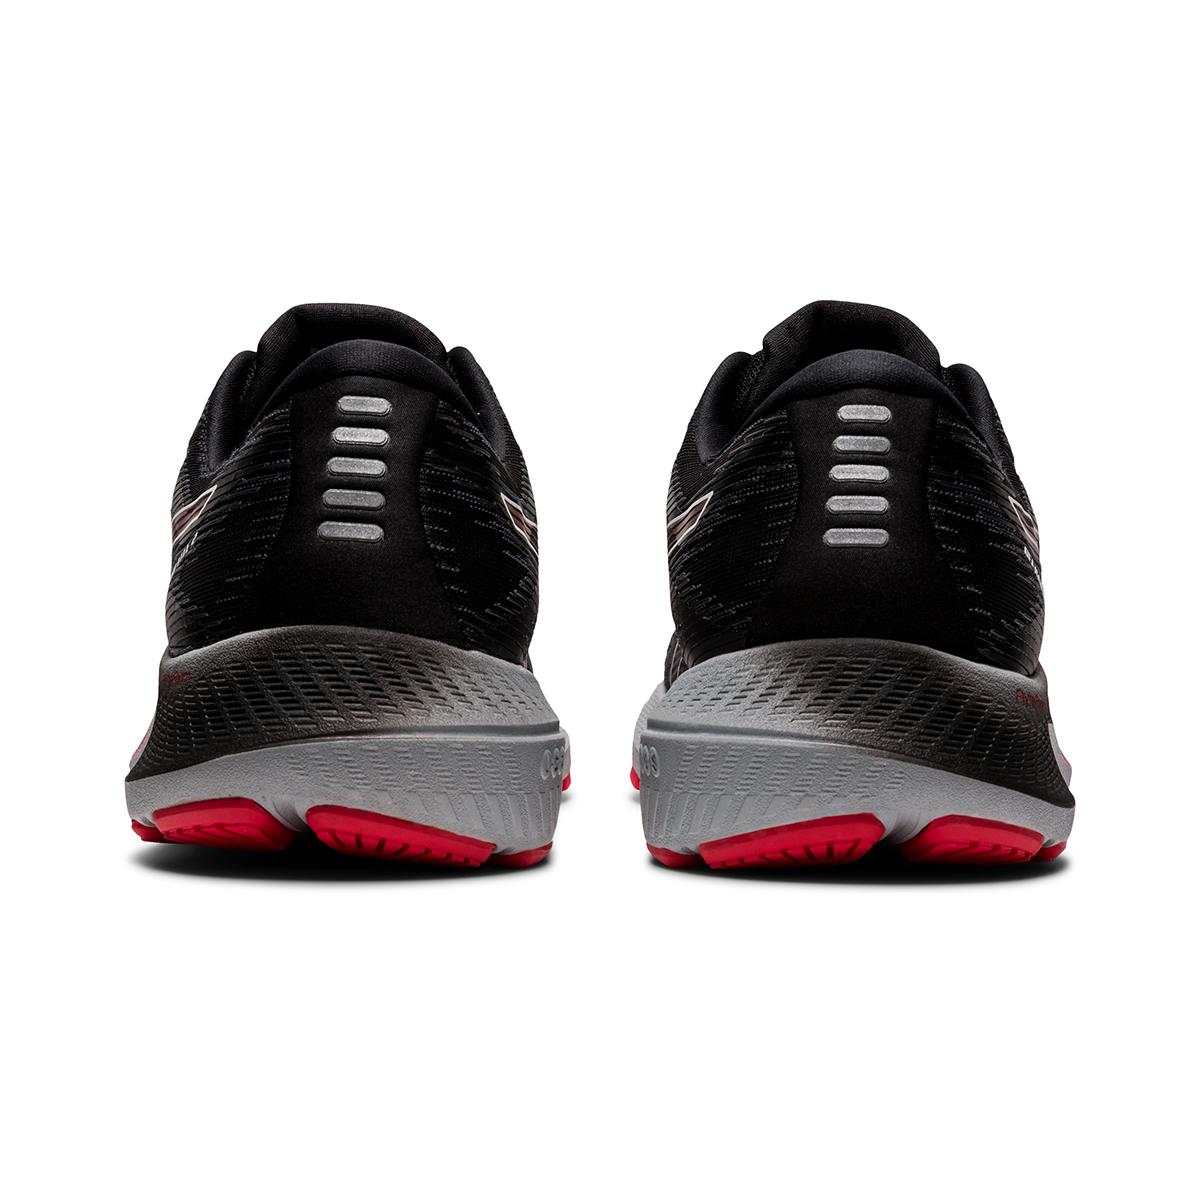 Men's Asics Gel-Kayano Lite 2 Running Shoe - Color: Black/White - Size: 7 - Width: Regular, Black/White, large, image 7